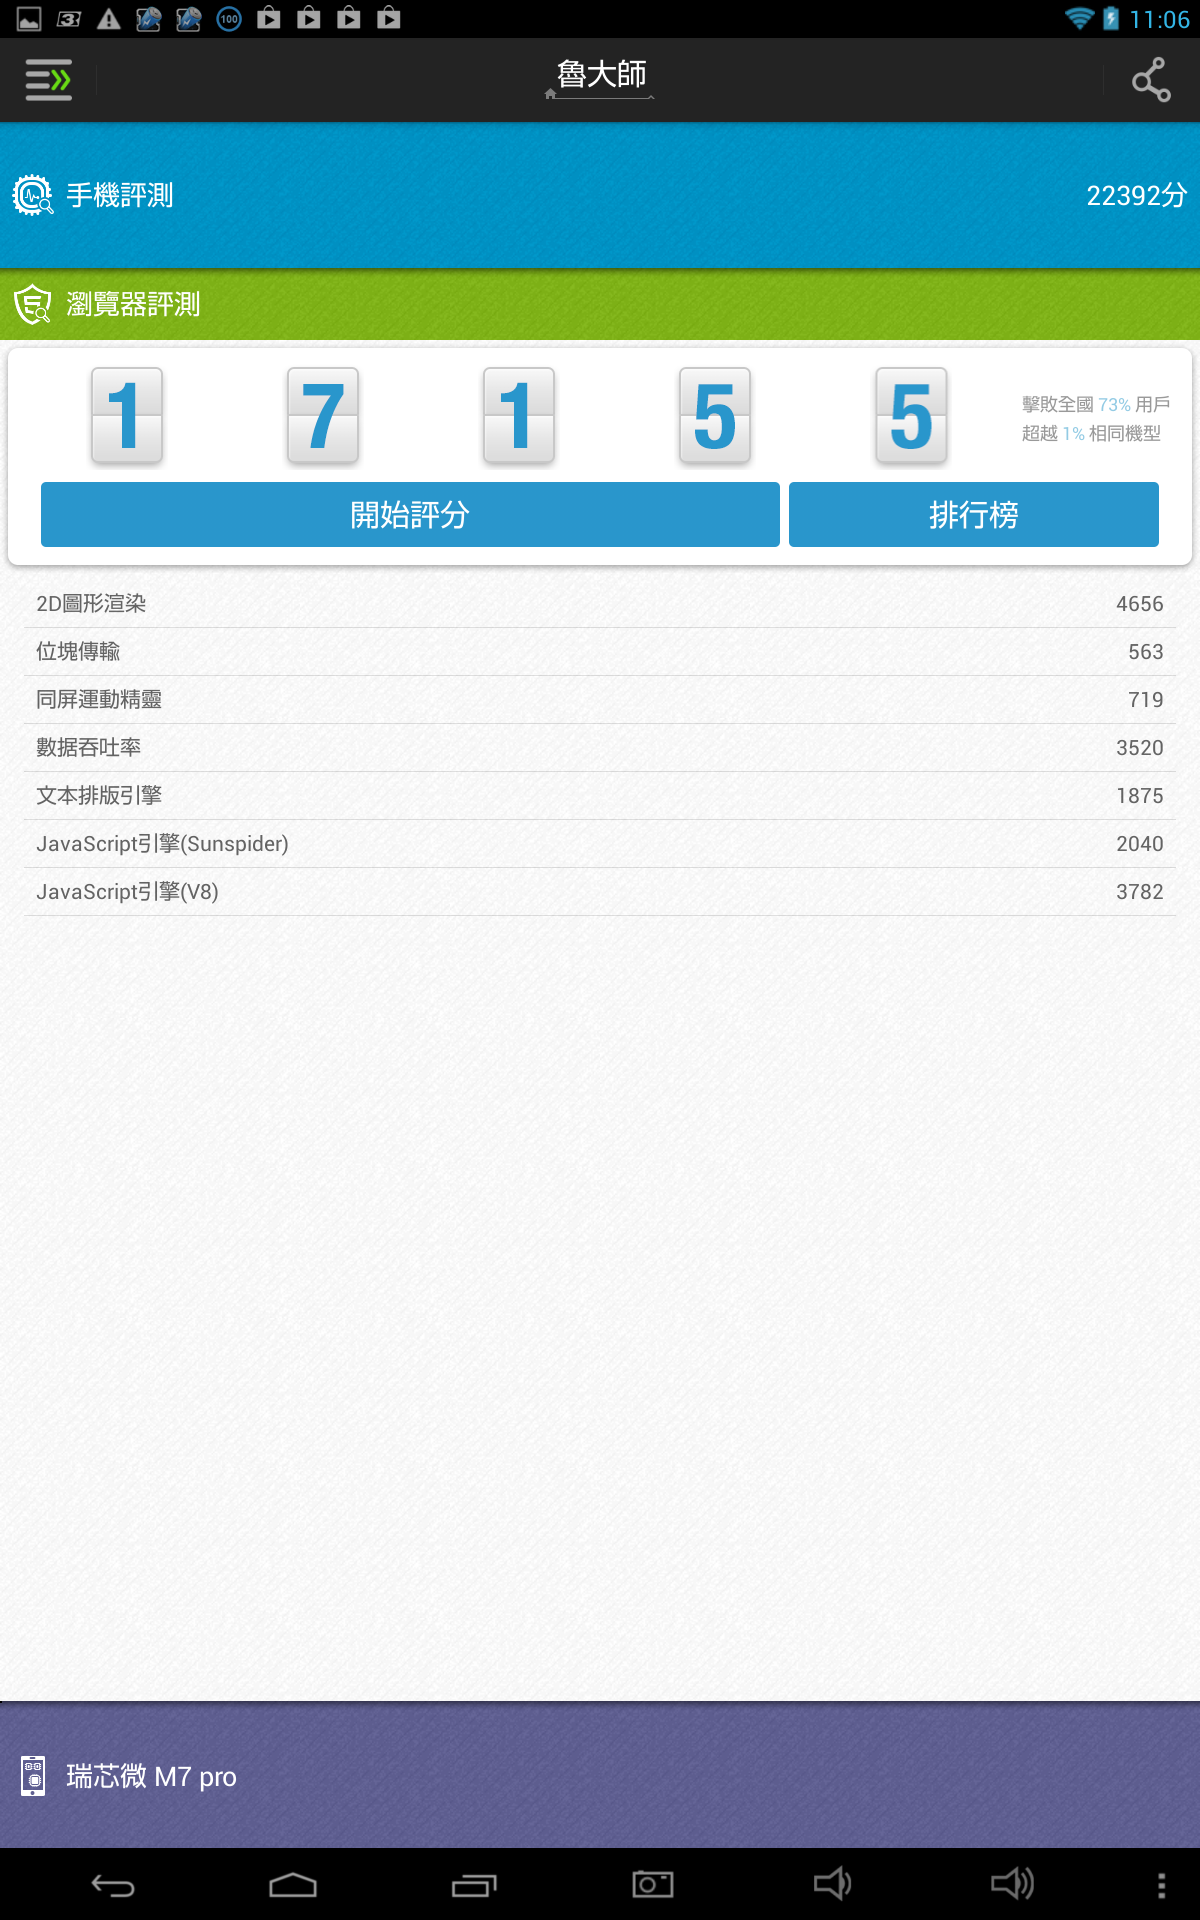 Screenshot_2013-08-07-11-06-07.png